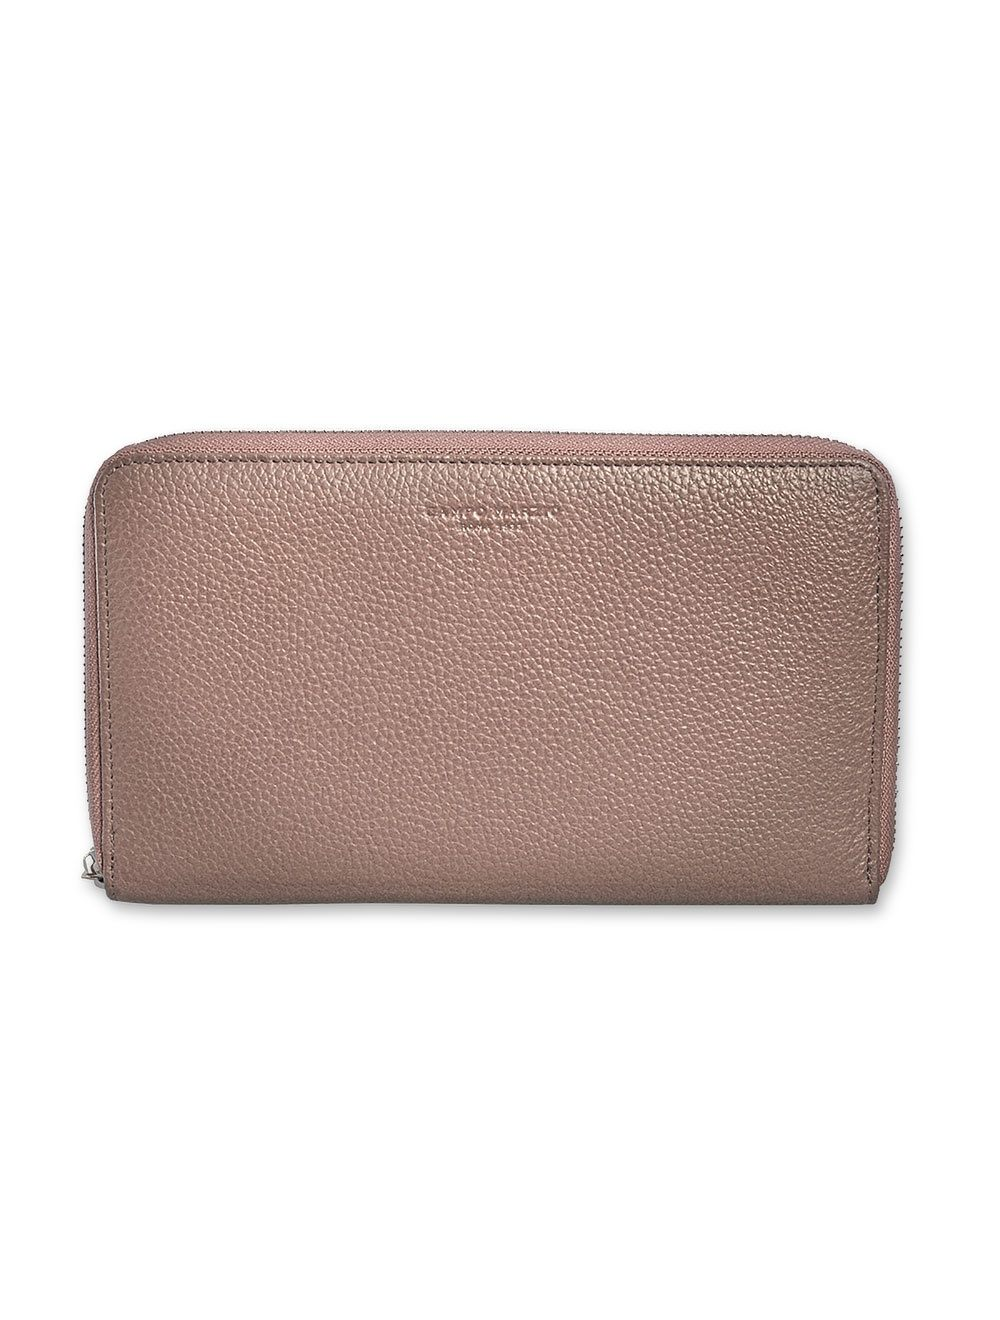 Princeton Wallet - Grey